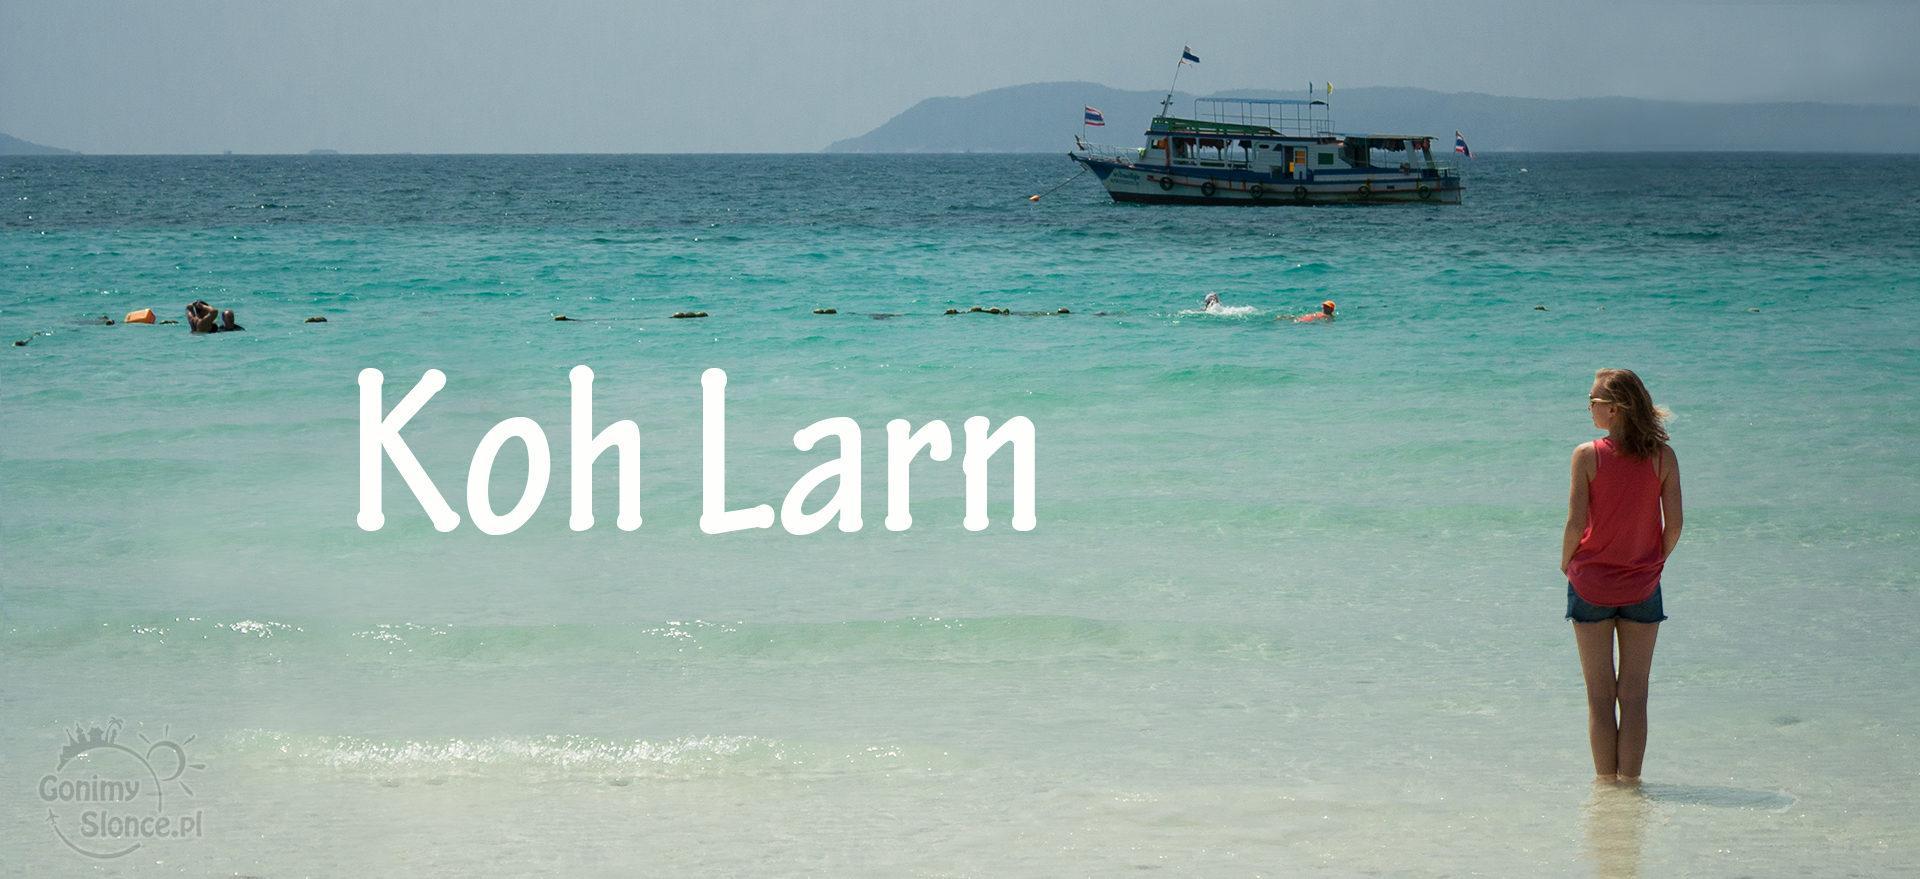 Koh Larn - rajska wyspa blisko Bangkoku / plaże blisko Bangkoku